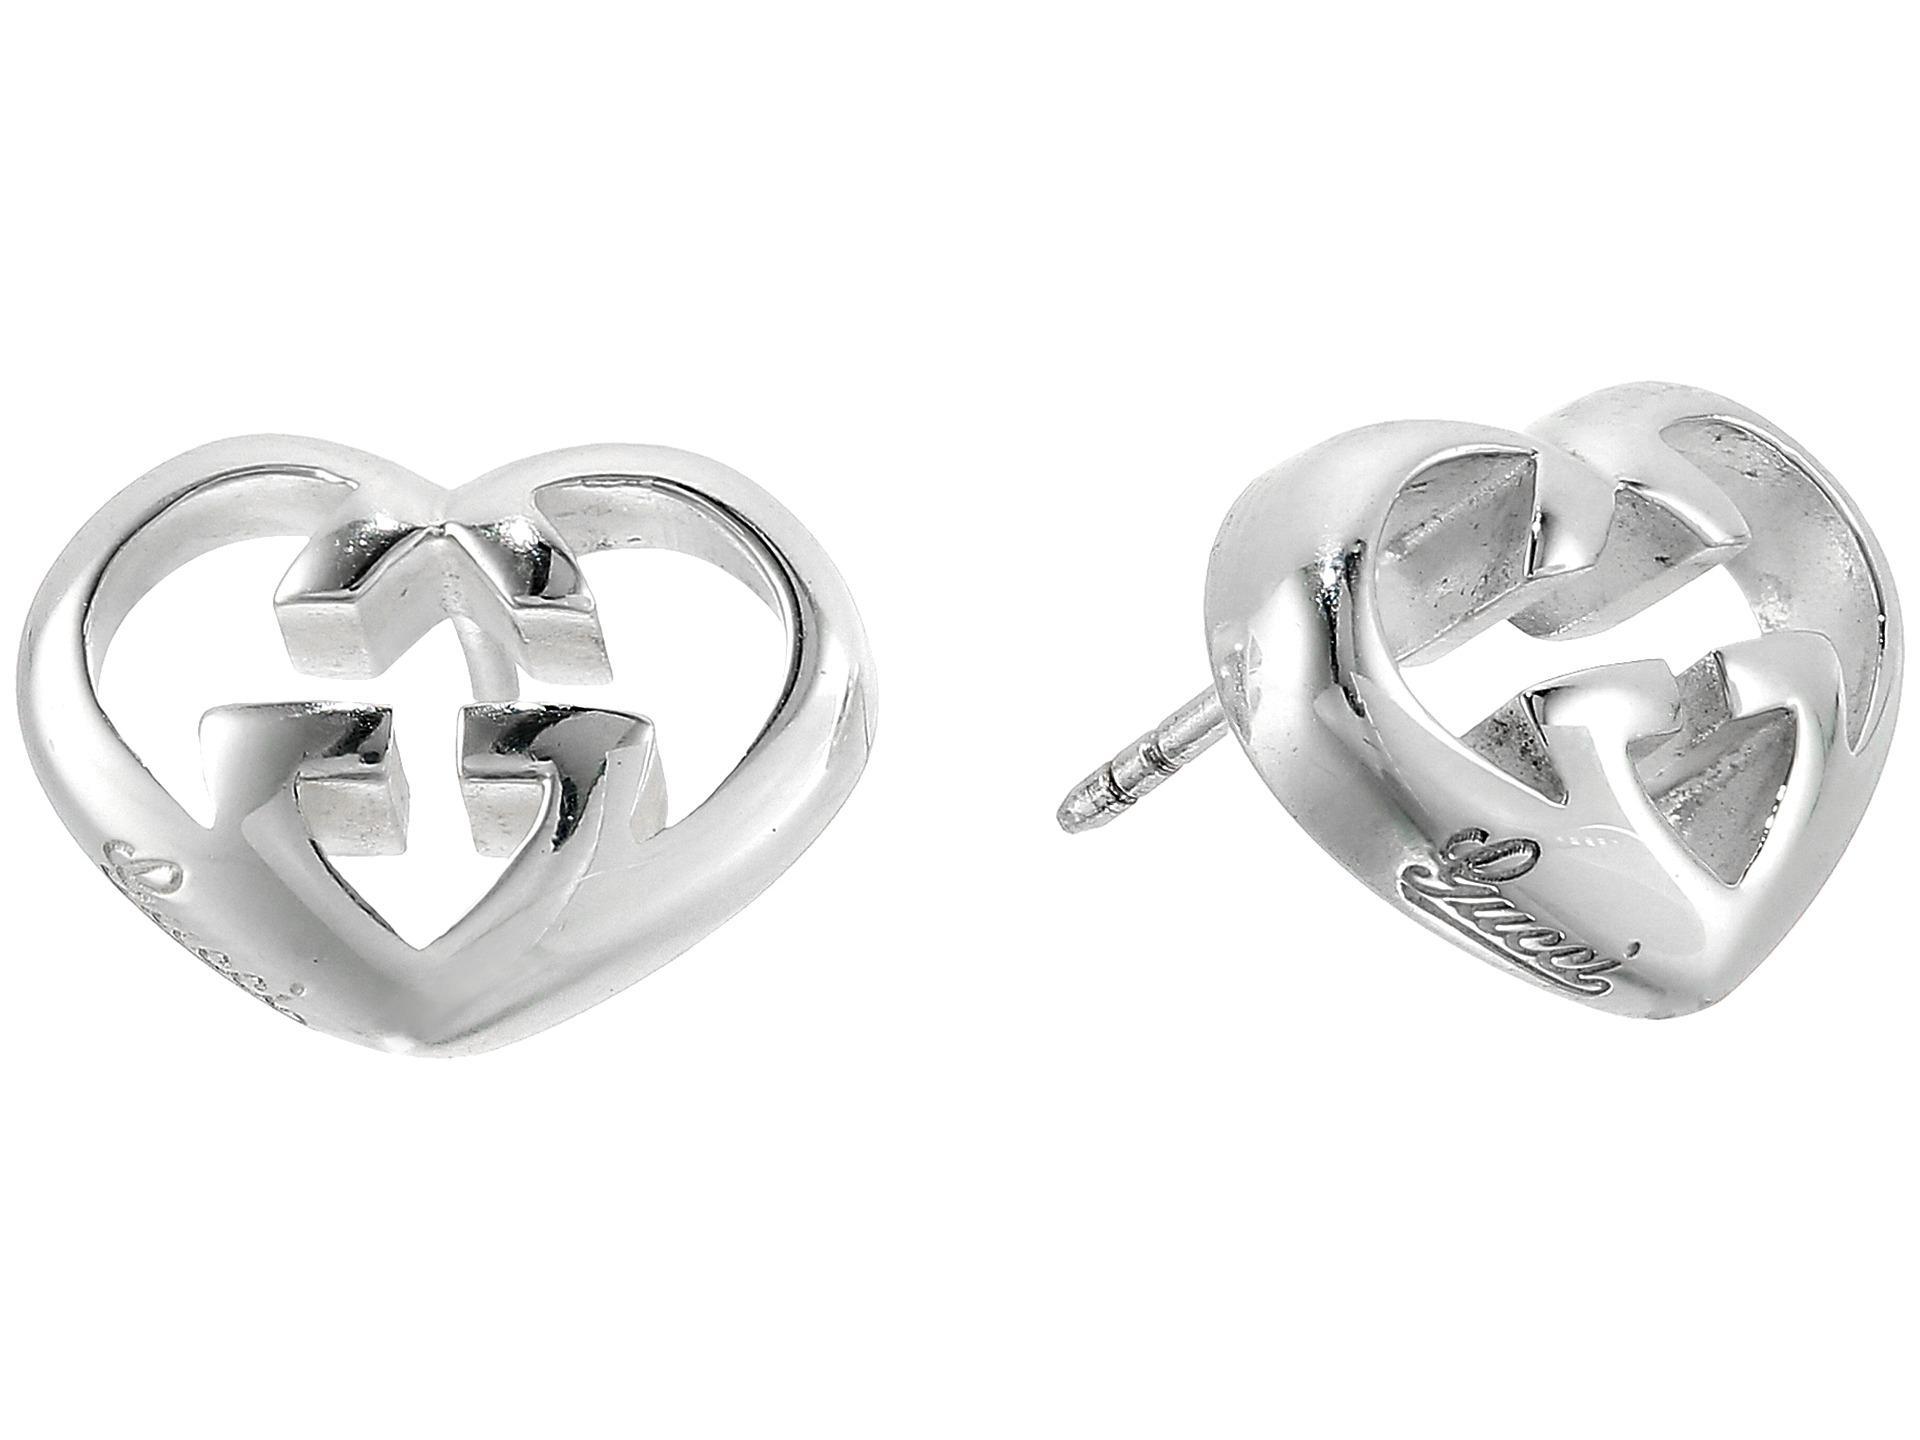 673e1a4d5fa Lyst - Gucci Love Britt Heart Earrings in Metallic